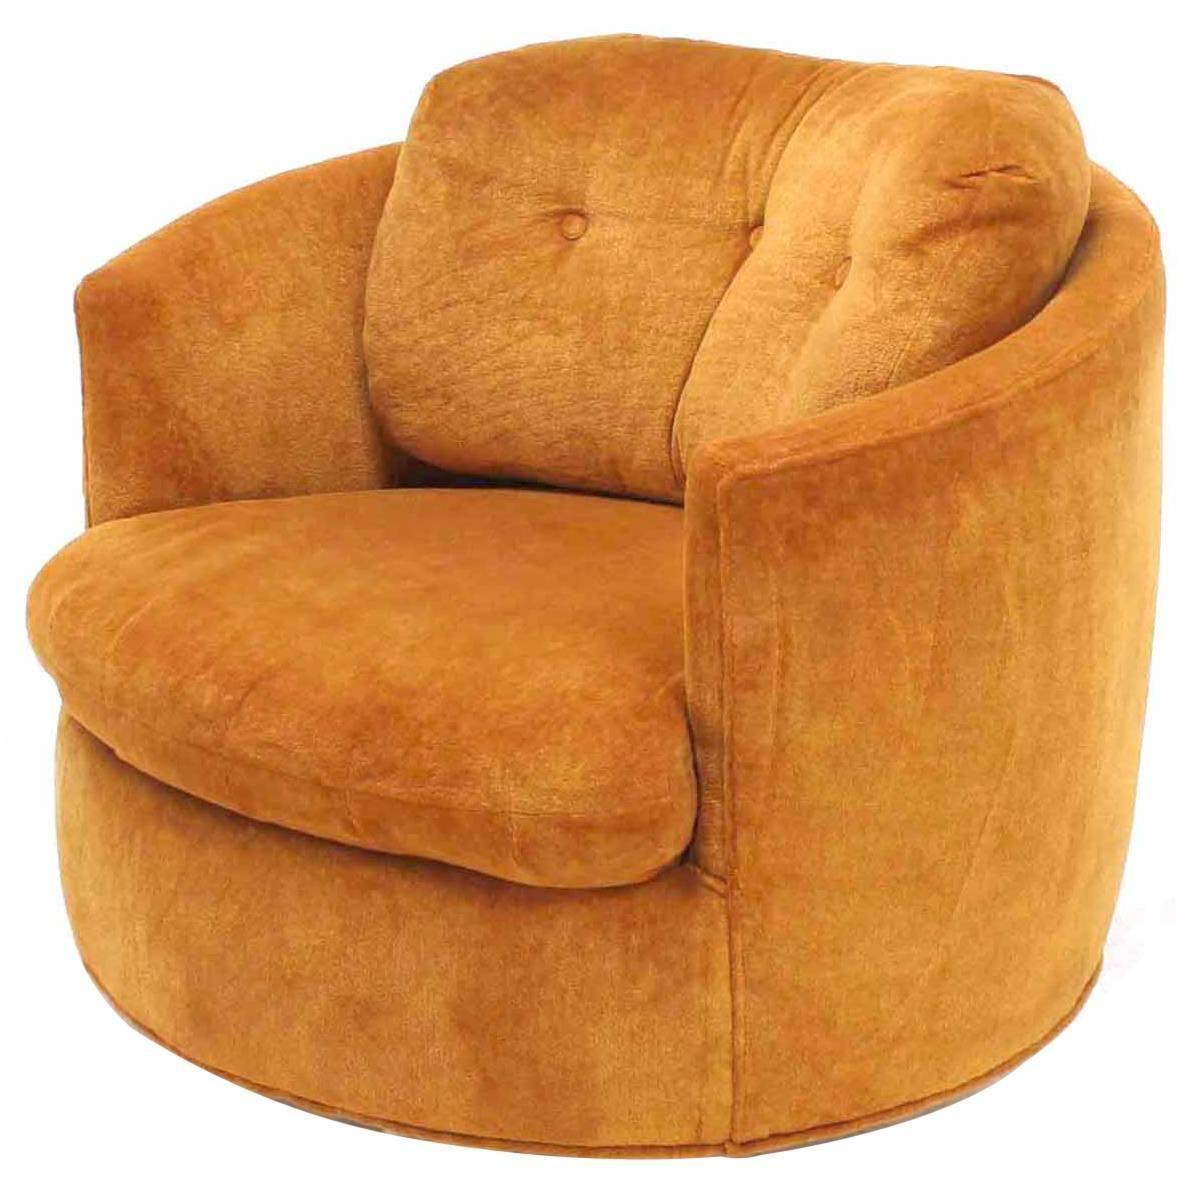 Mid Century Modern Round Barrel Back Swivel Lounge Chair Vintage Lounge Chair Round Swivel Chair Chair #round #swivel #living #room #chair